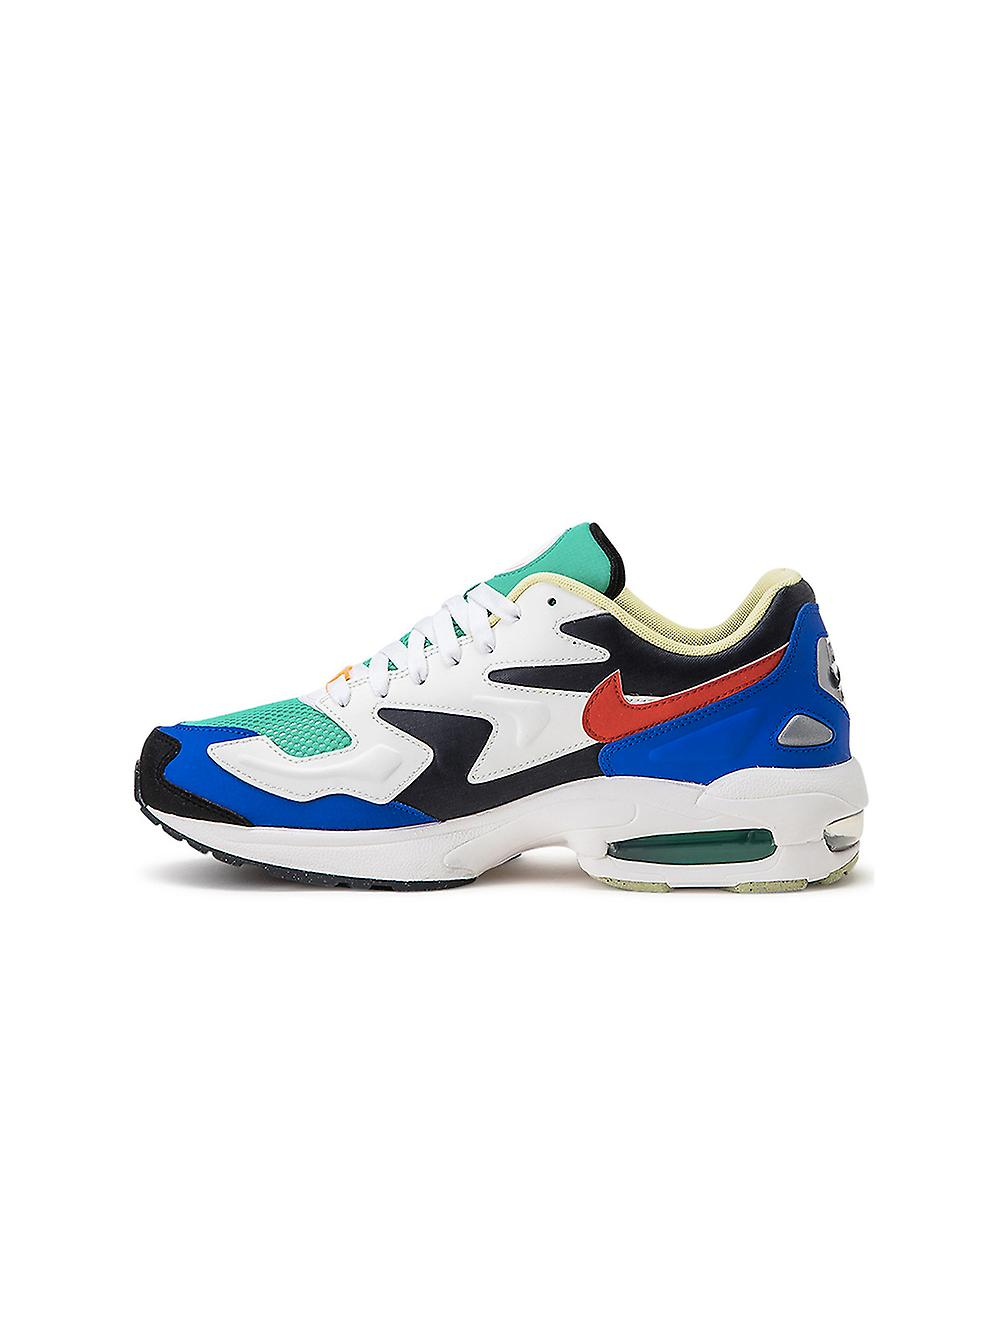 Nike Ezcr004025 Men's Multicolor Fabric Sneakers